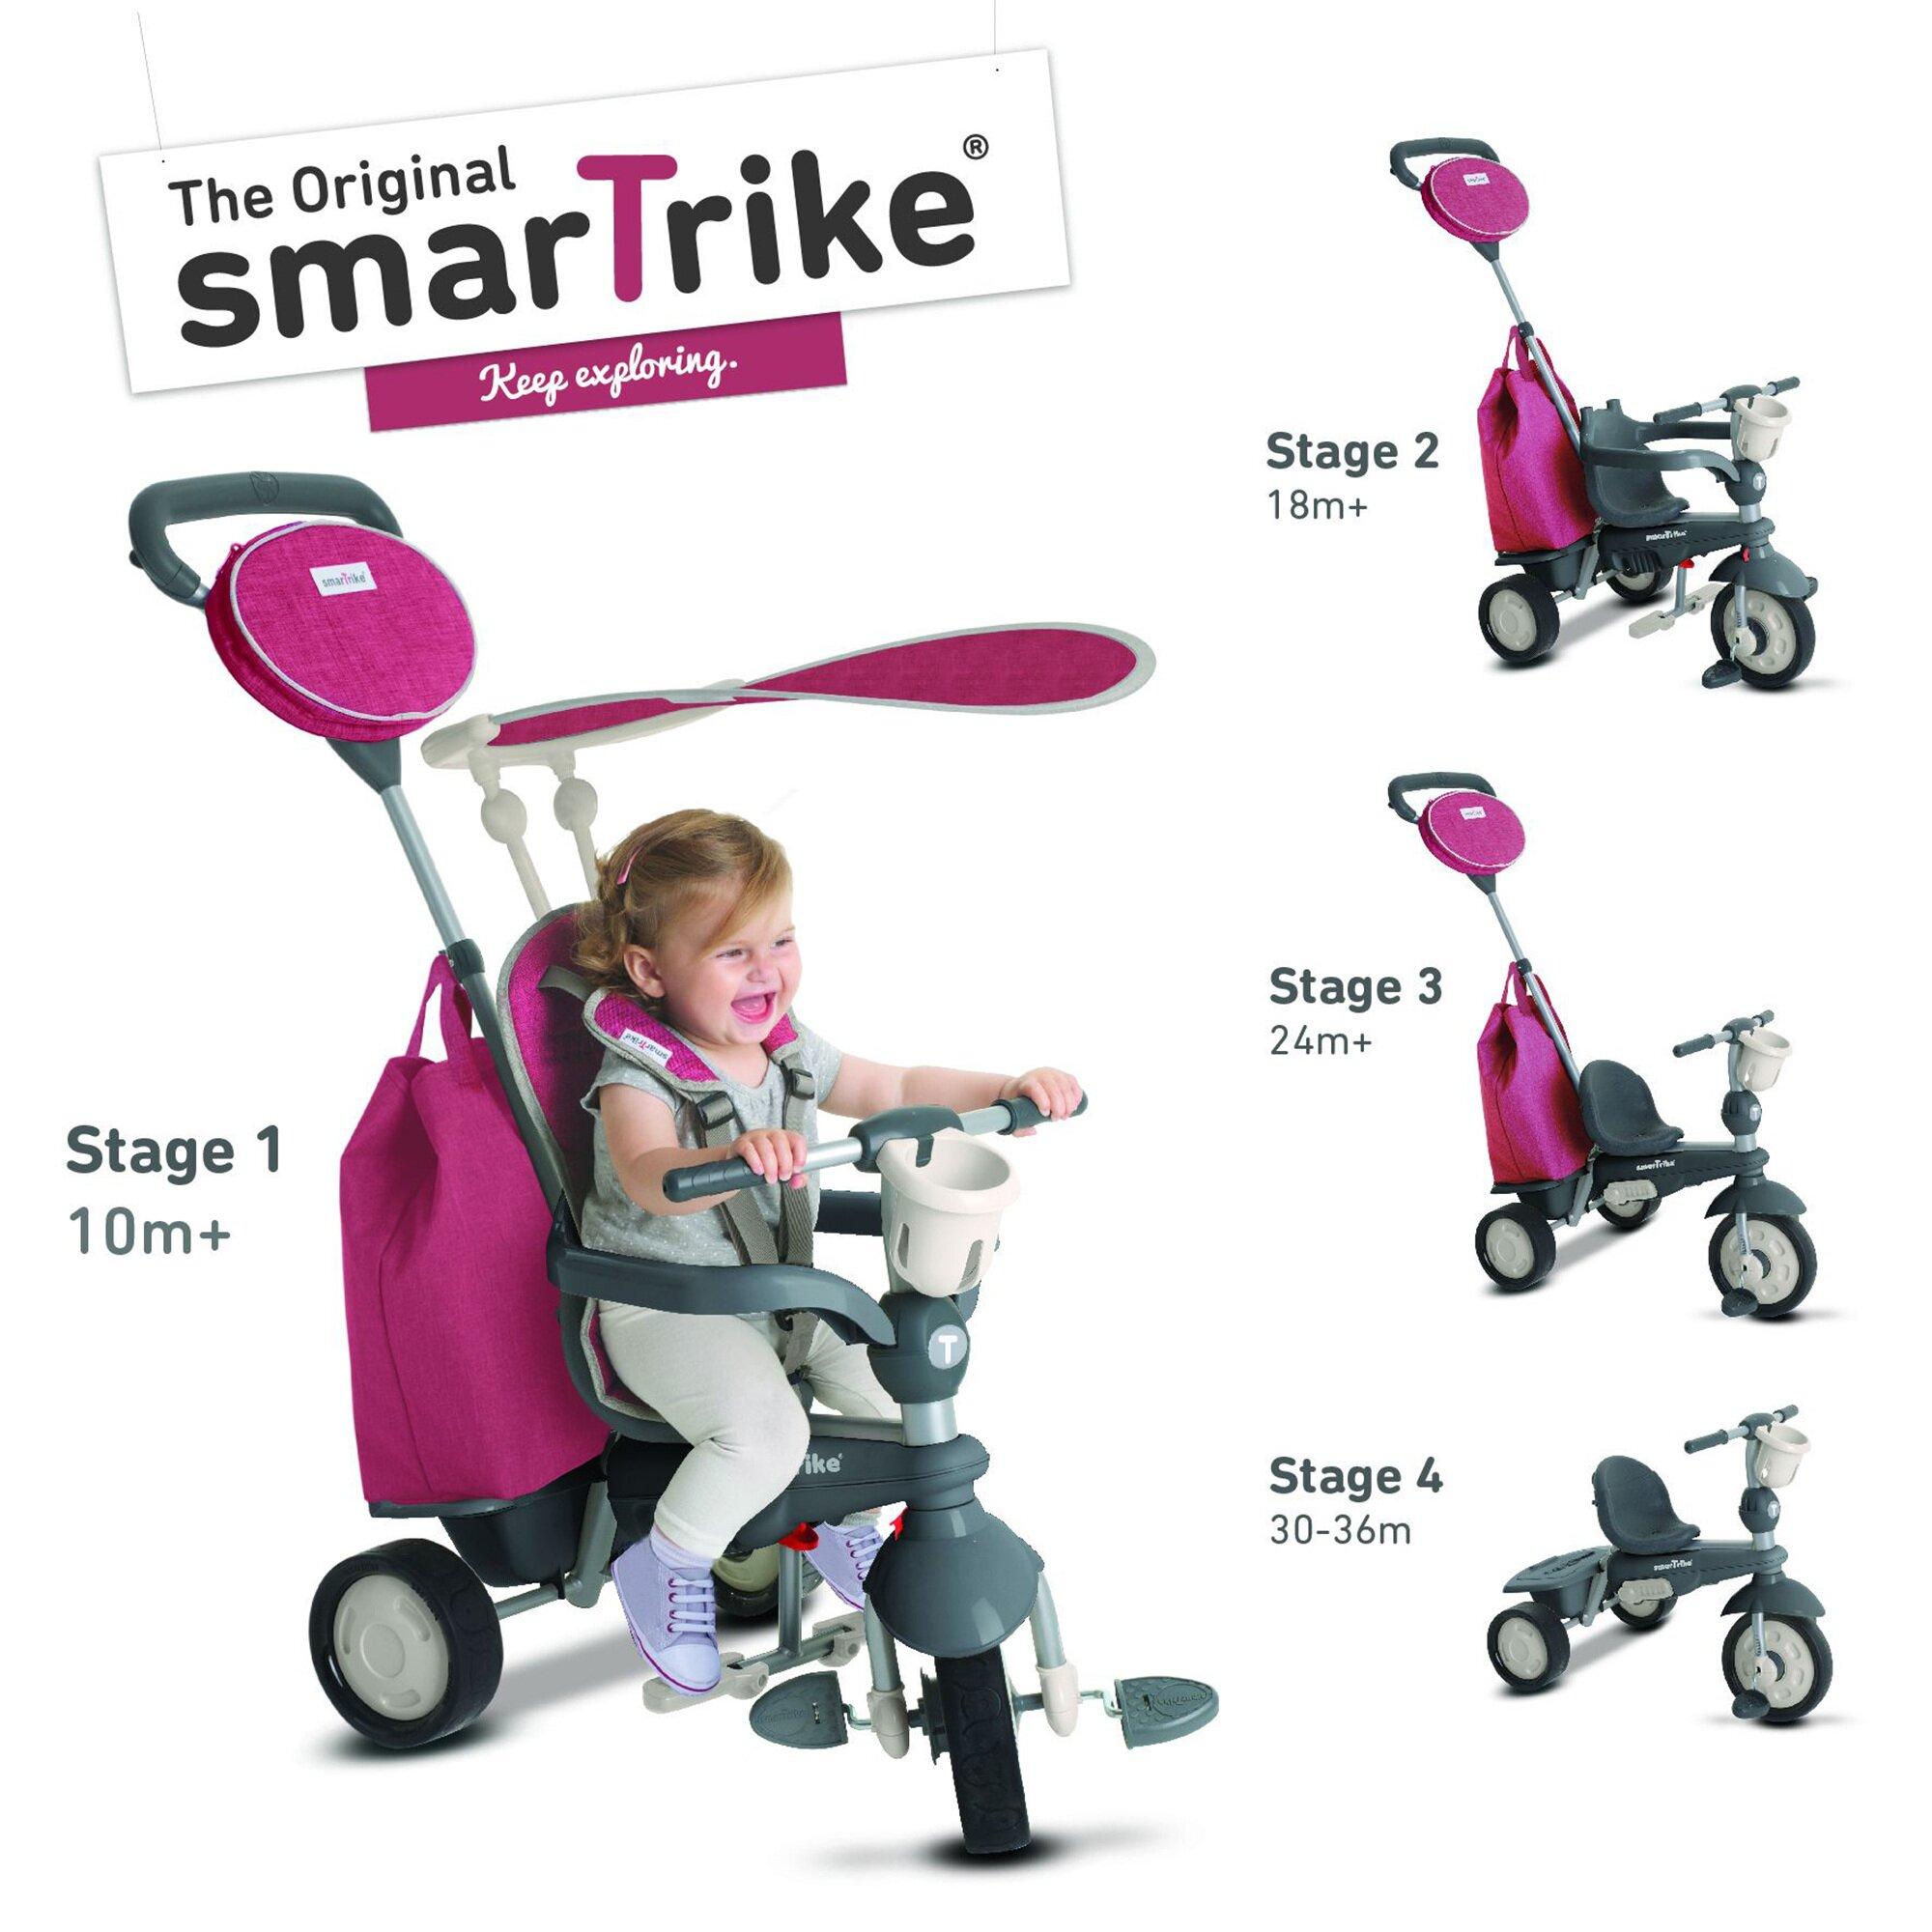 smartrike-dreirad-voyage-4-in-1